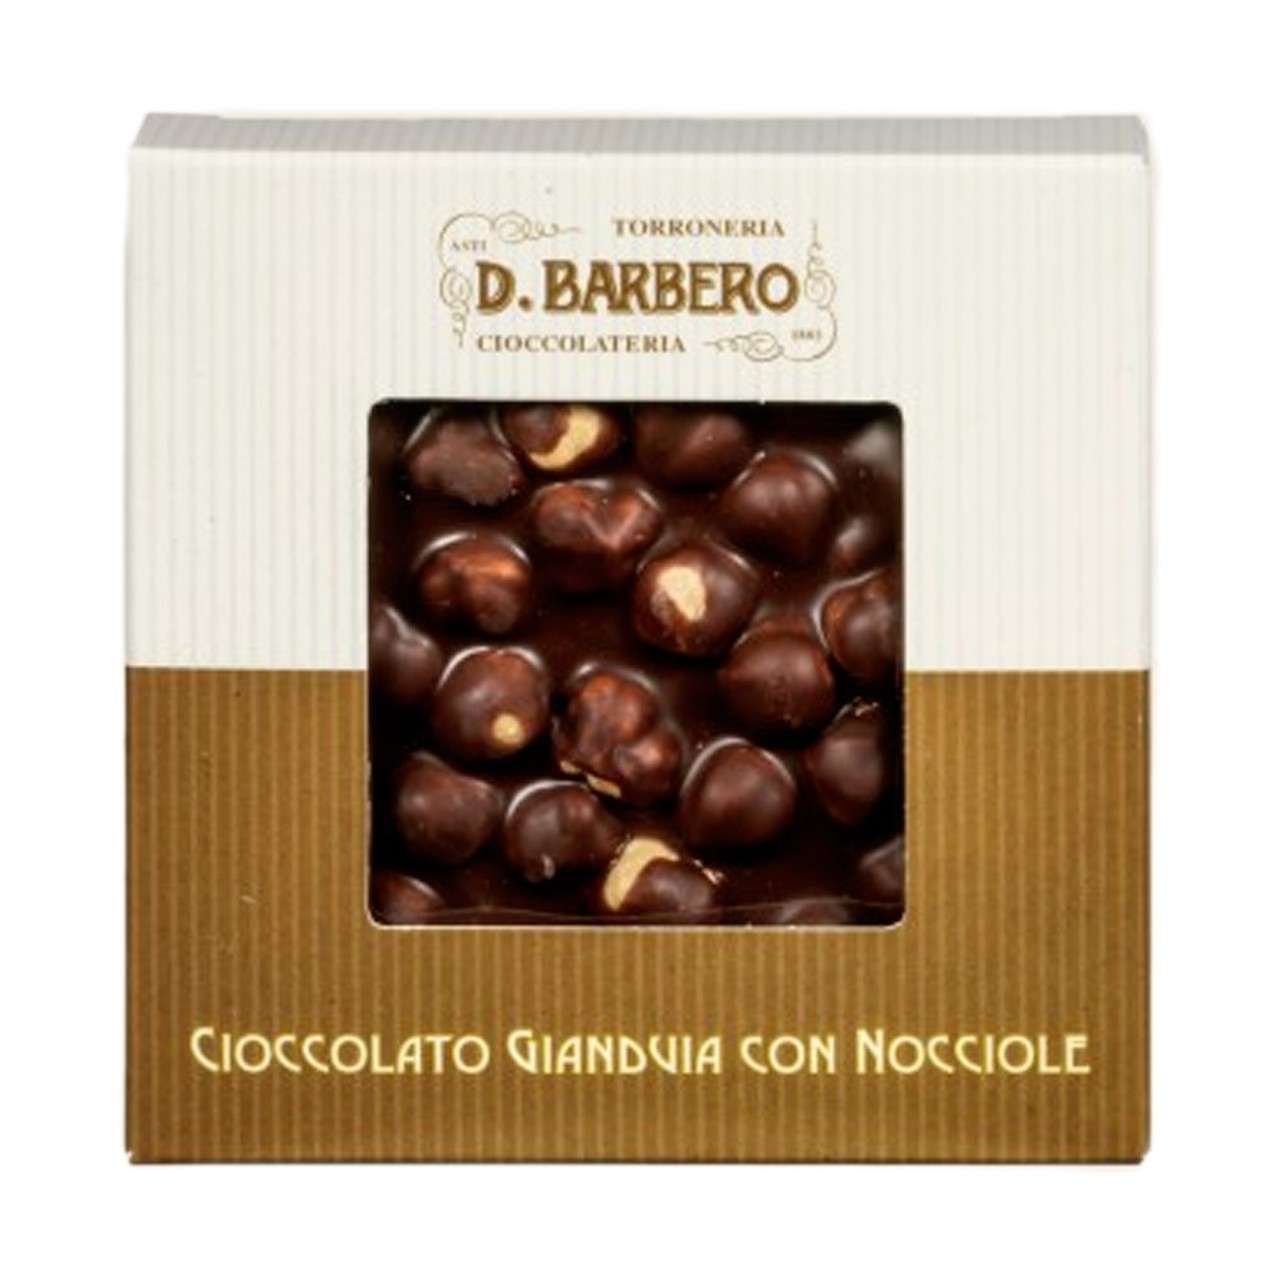 Gianduia chocolate with Piedmont hazelnuts IGP full